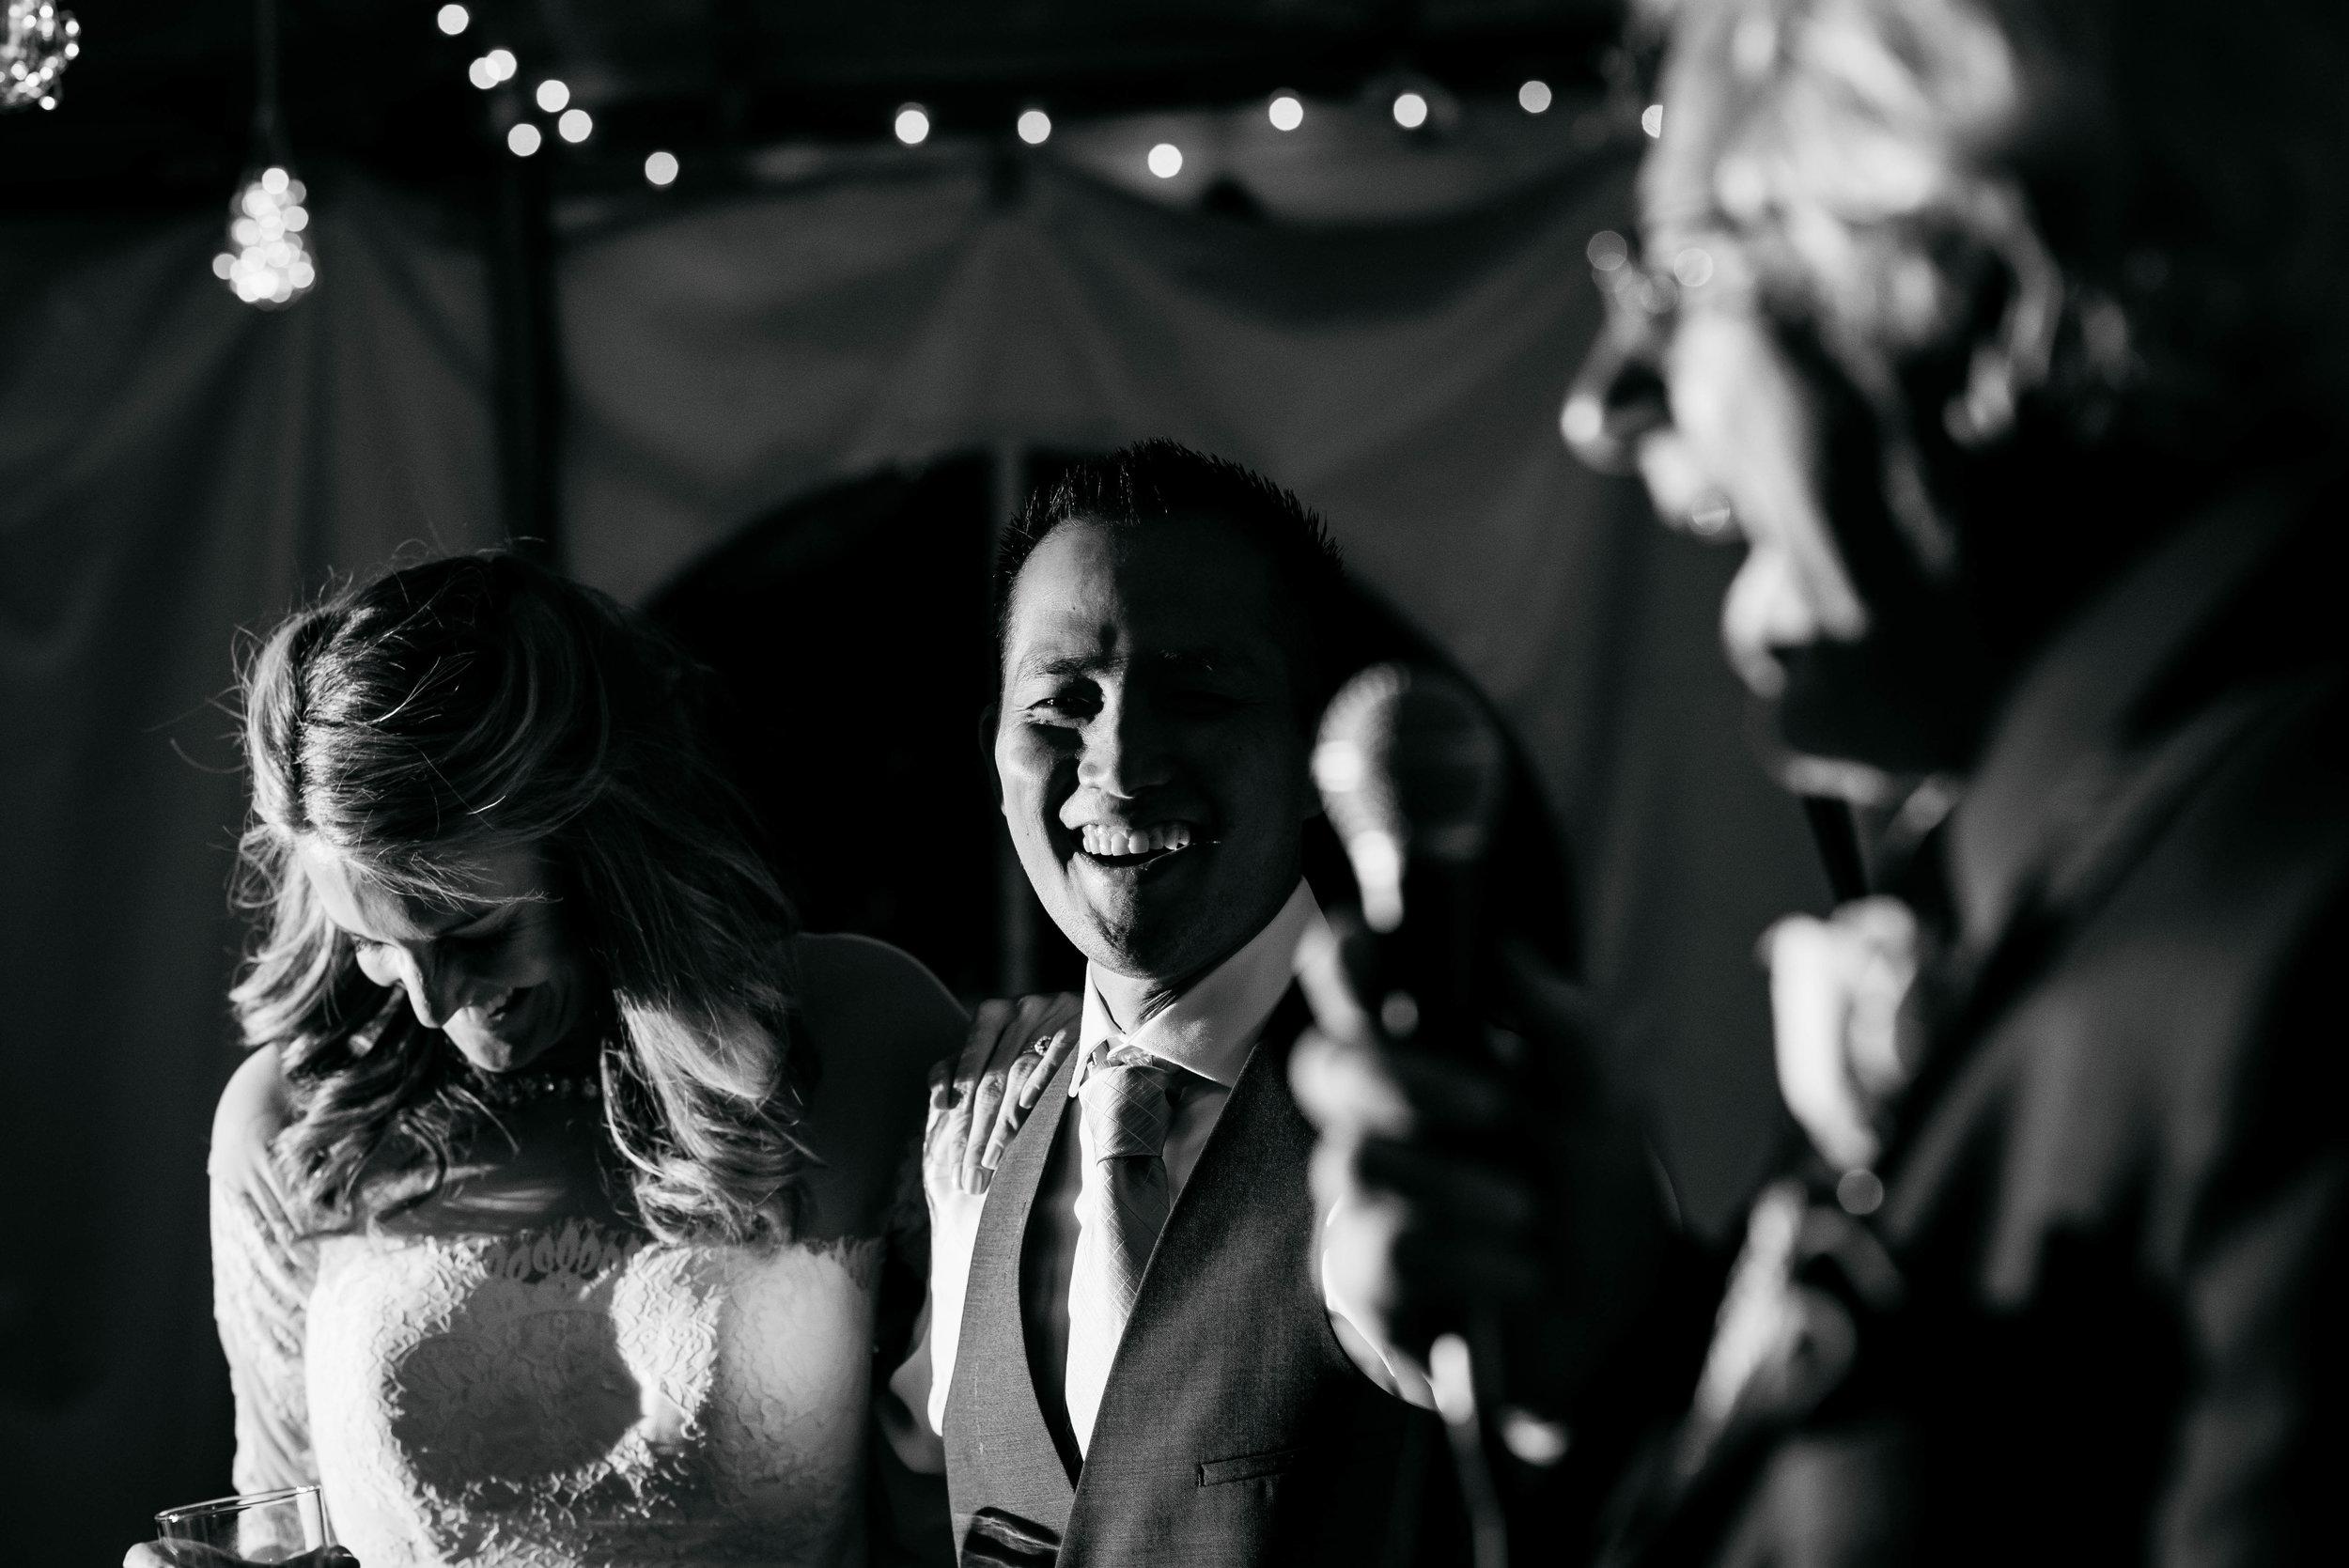 Extended Play Photography documentary wedding photography in Albuquerque, New Mexico. Capitan wedding reception speechescandid.